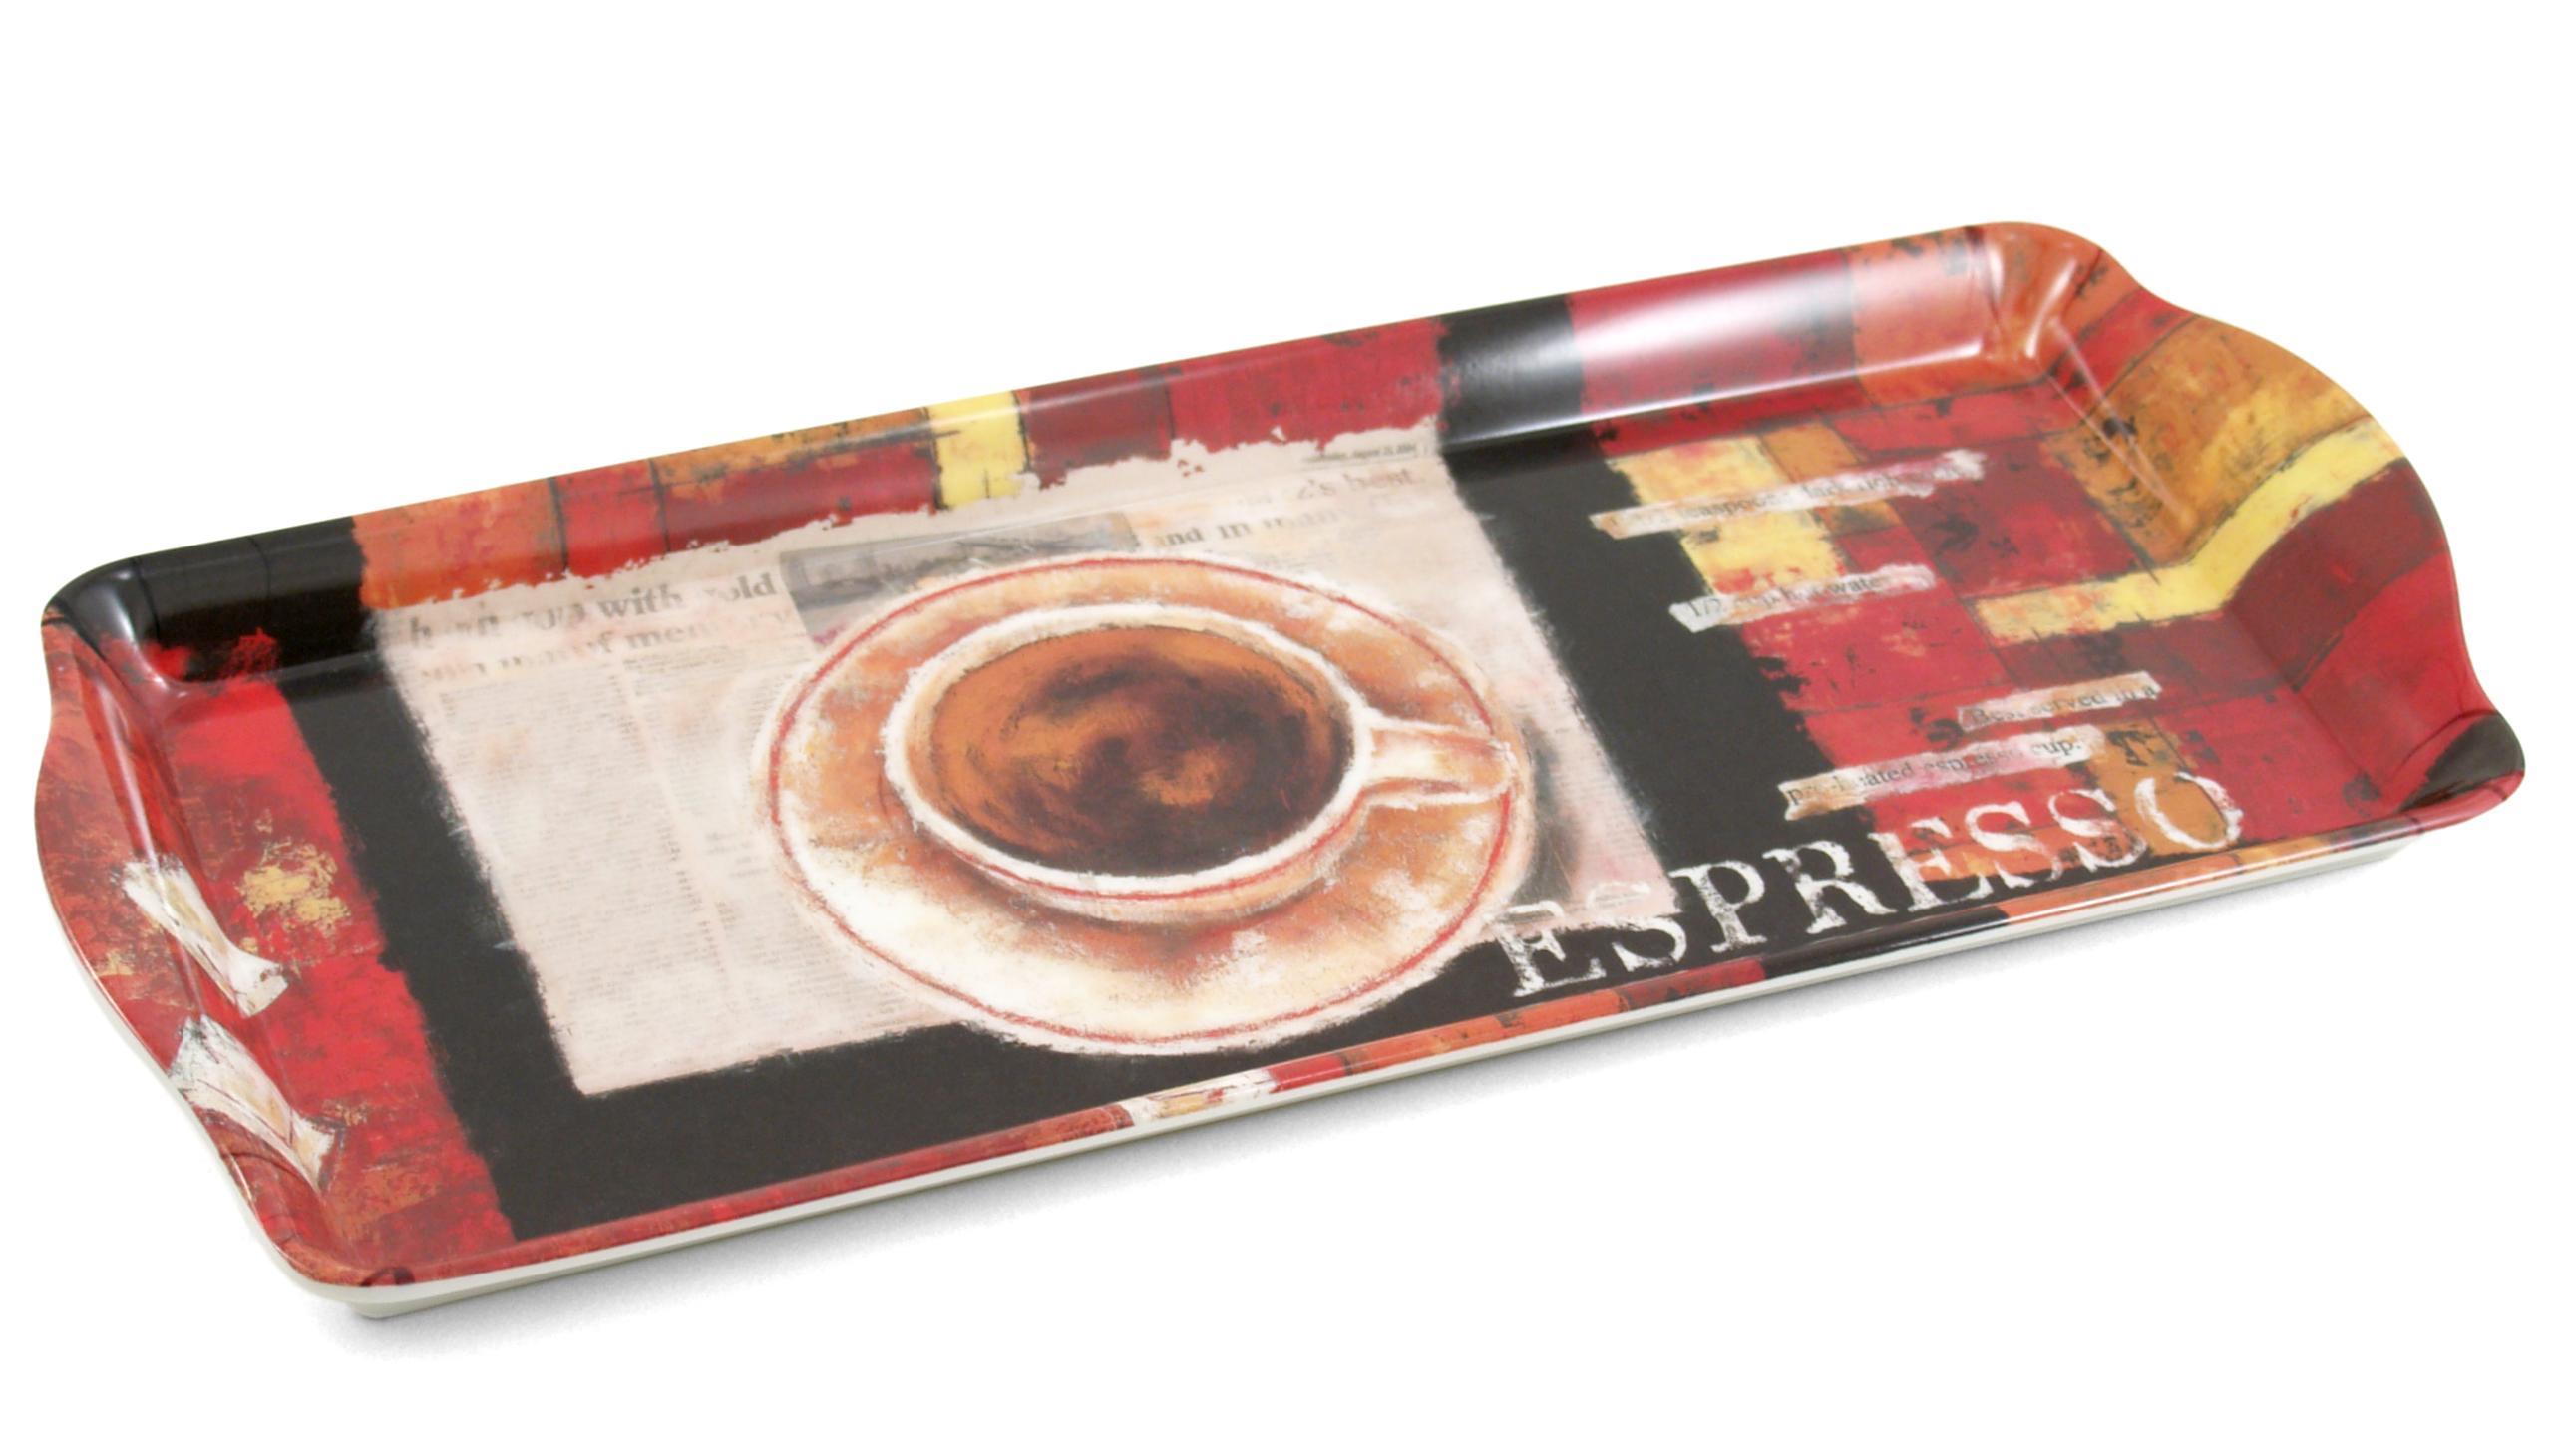 Melamine Serving Tray with Espresso Cafe Printed Design, 15 x 6.75 Inch